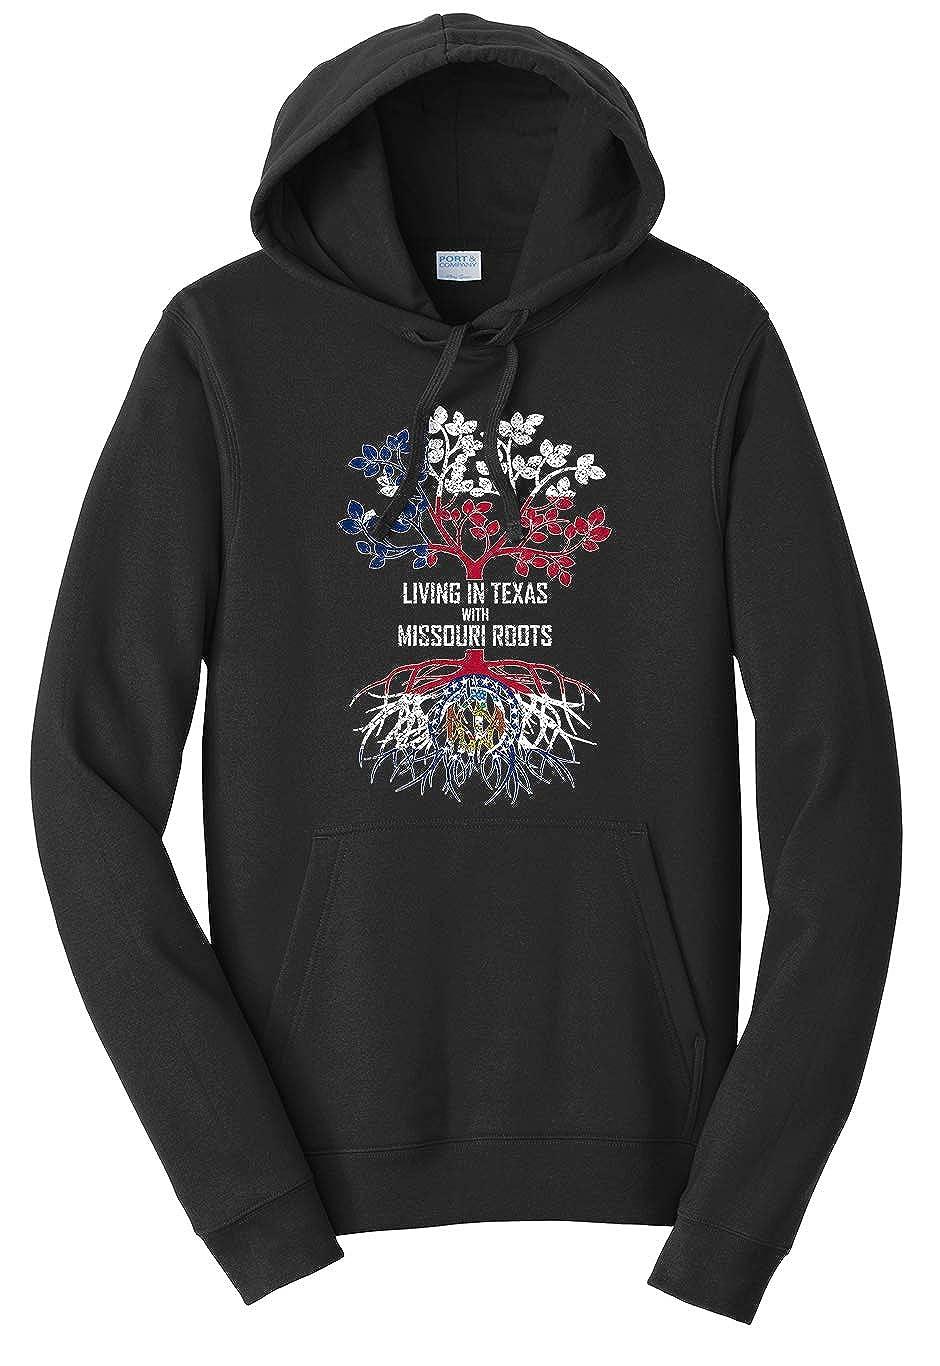 Tenacitee Unisex Living in Texas with Missouri Roots Sweatshirt